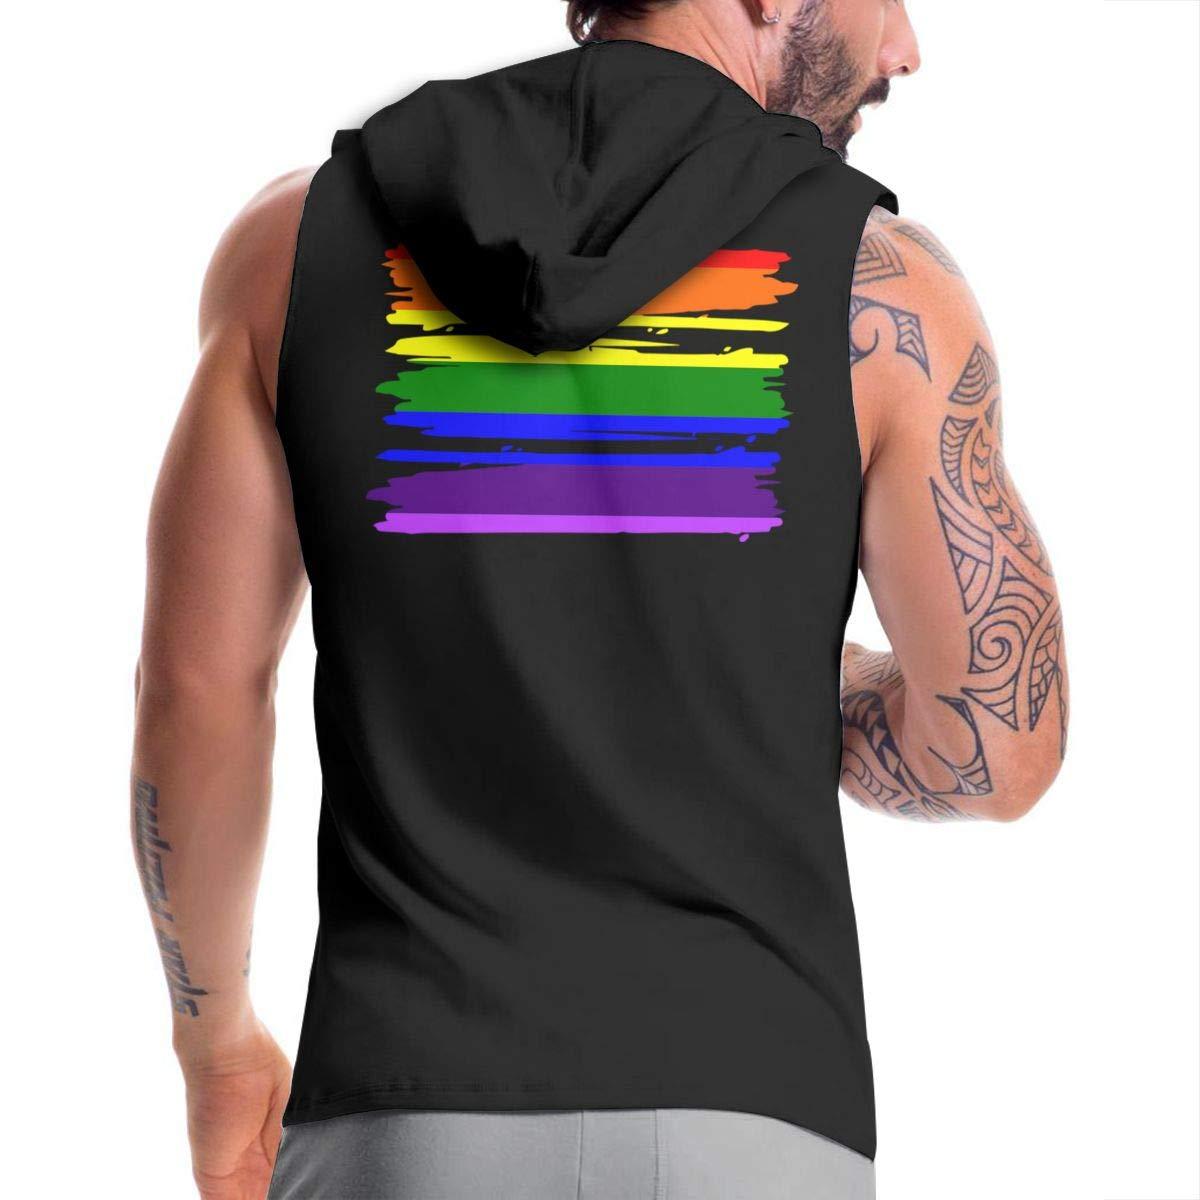 BMWEITIHBQ Mens Sleeveless Hoodie LGBT Flag Zip Up Vest